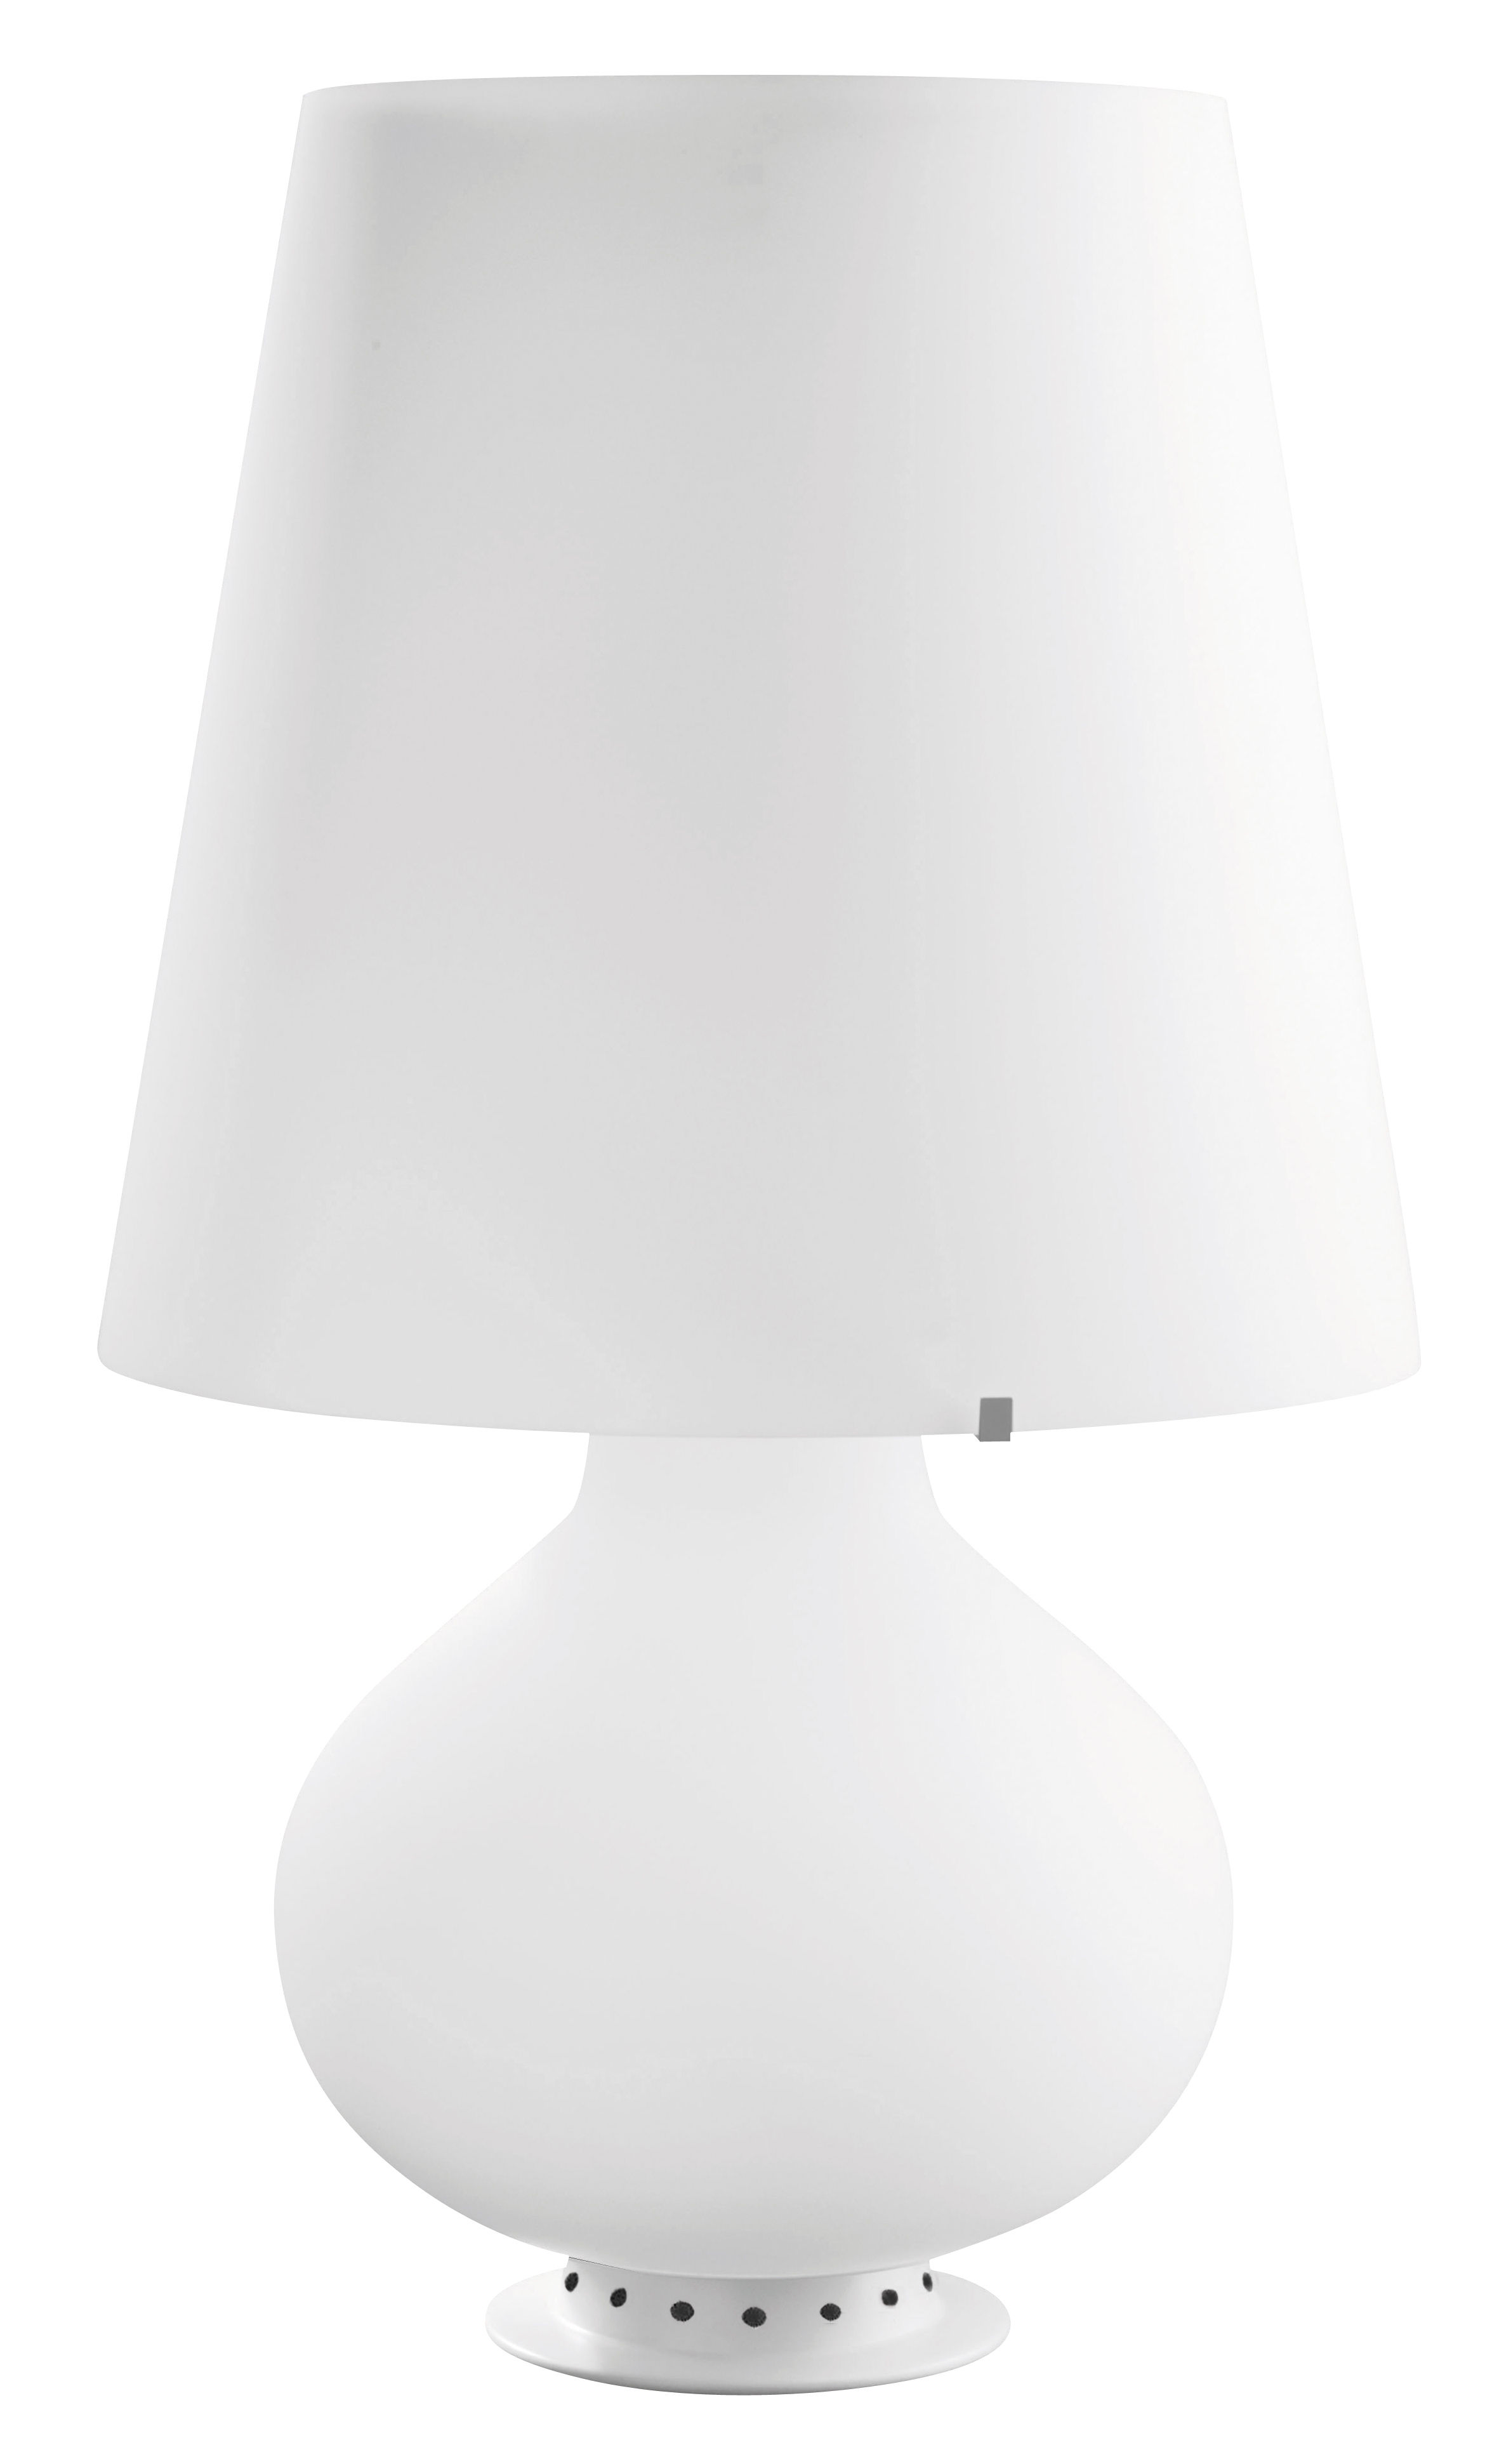 Luminaire - Lampes de table - Lampe de table Fontana Small / H 34 cm - Verre - Fontana Arte - Blanc - Métal, Verre soufflé